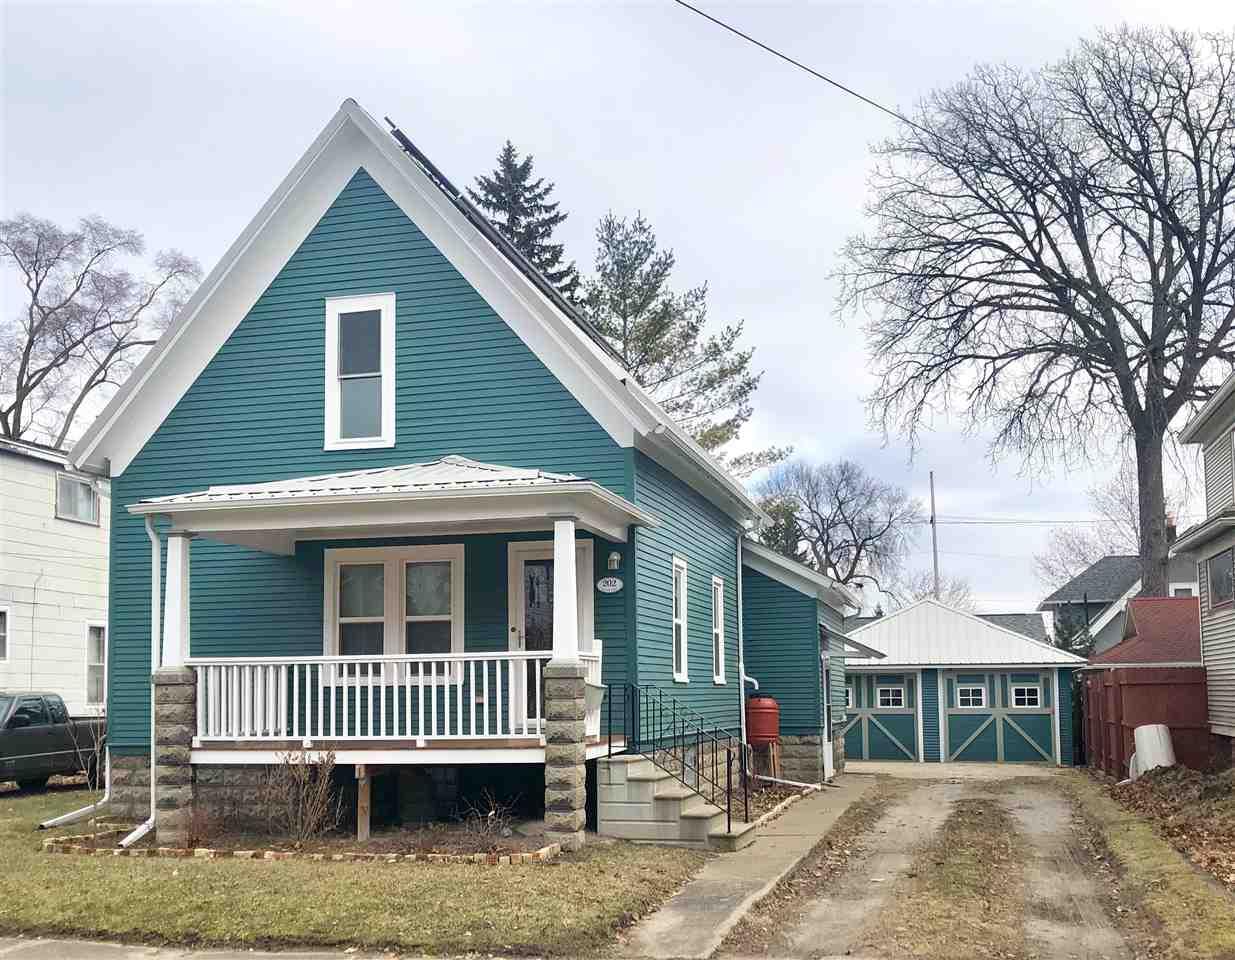 Prime Residential Condo For Sale In Bay City Michigan 31368965 Beutiful Home Inspiration Truamahrainfo